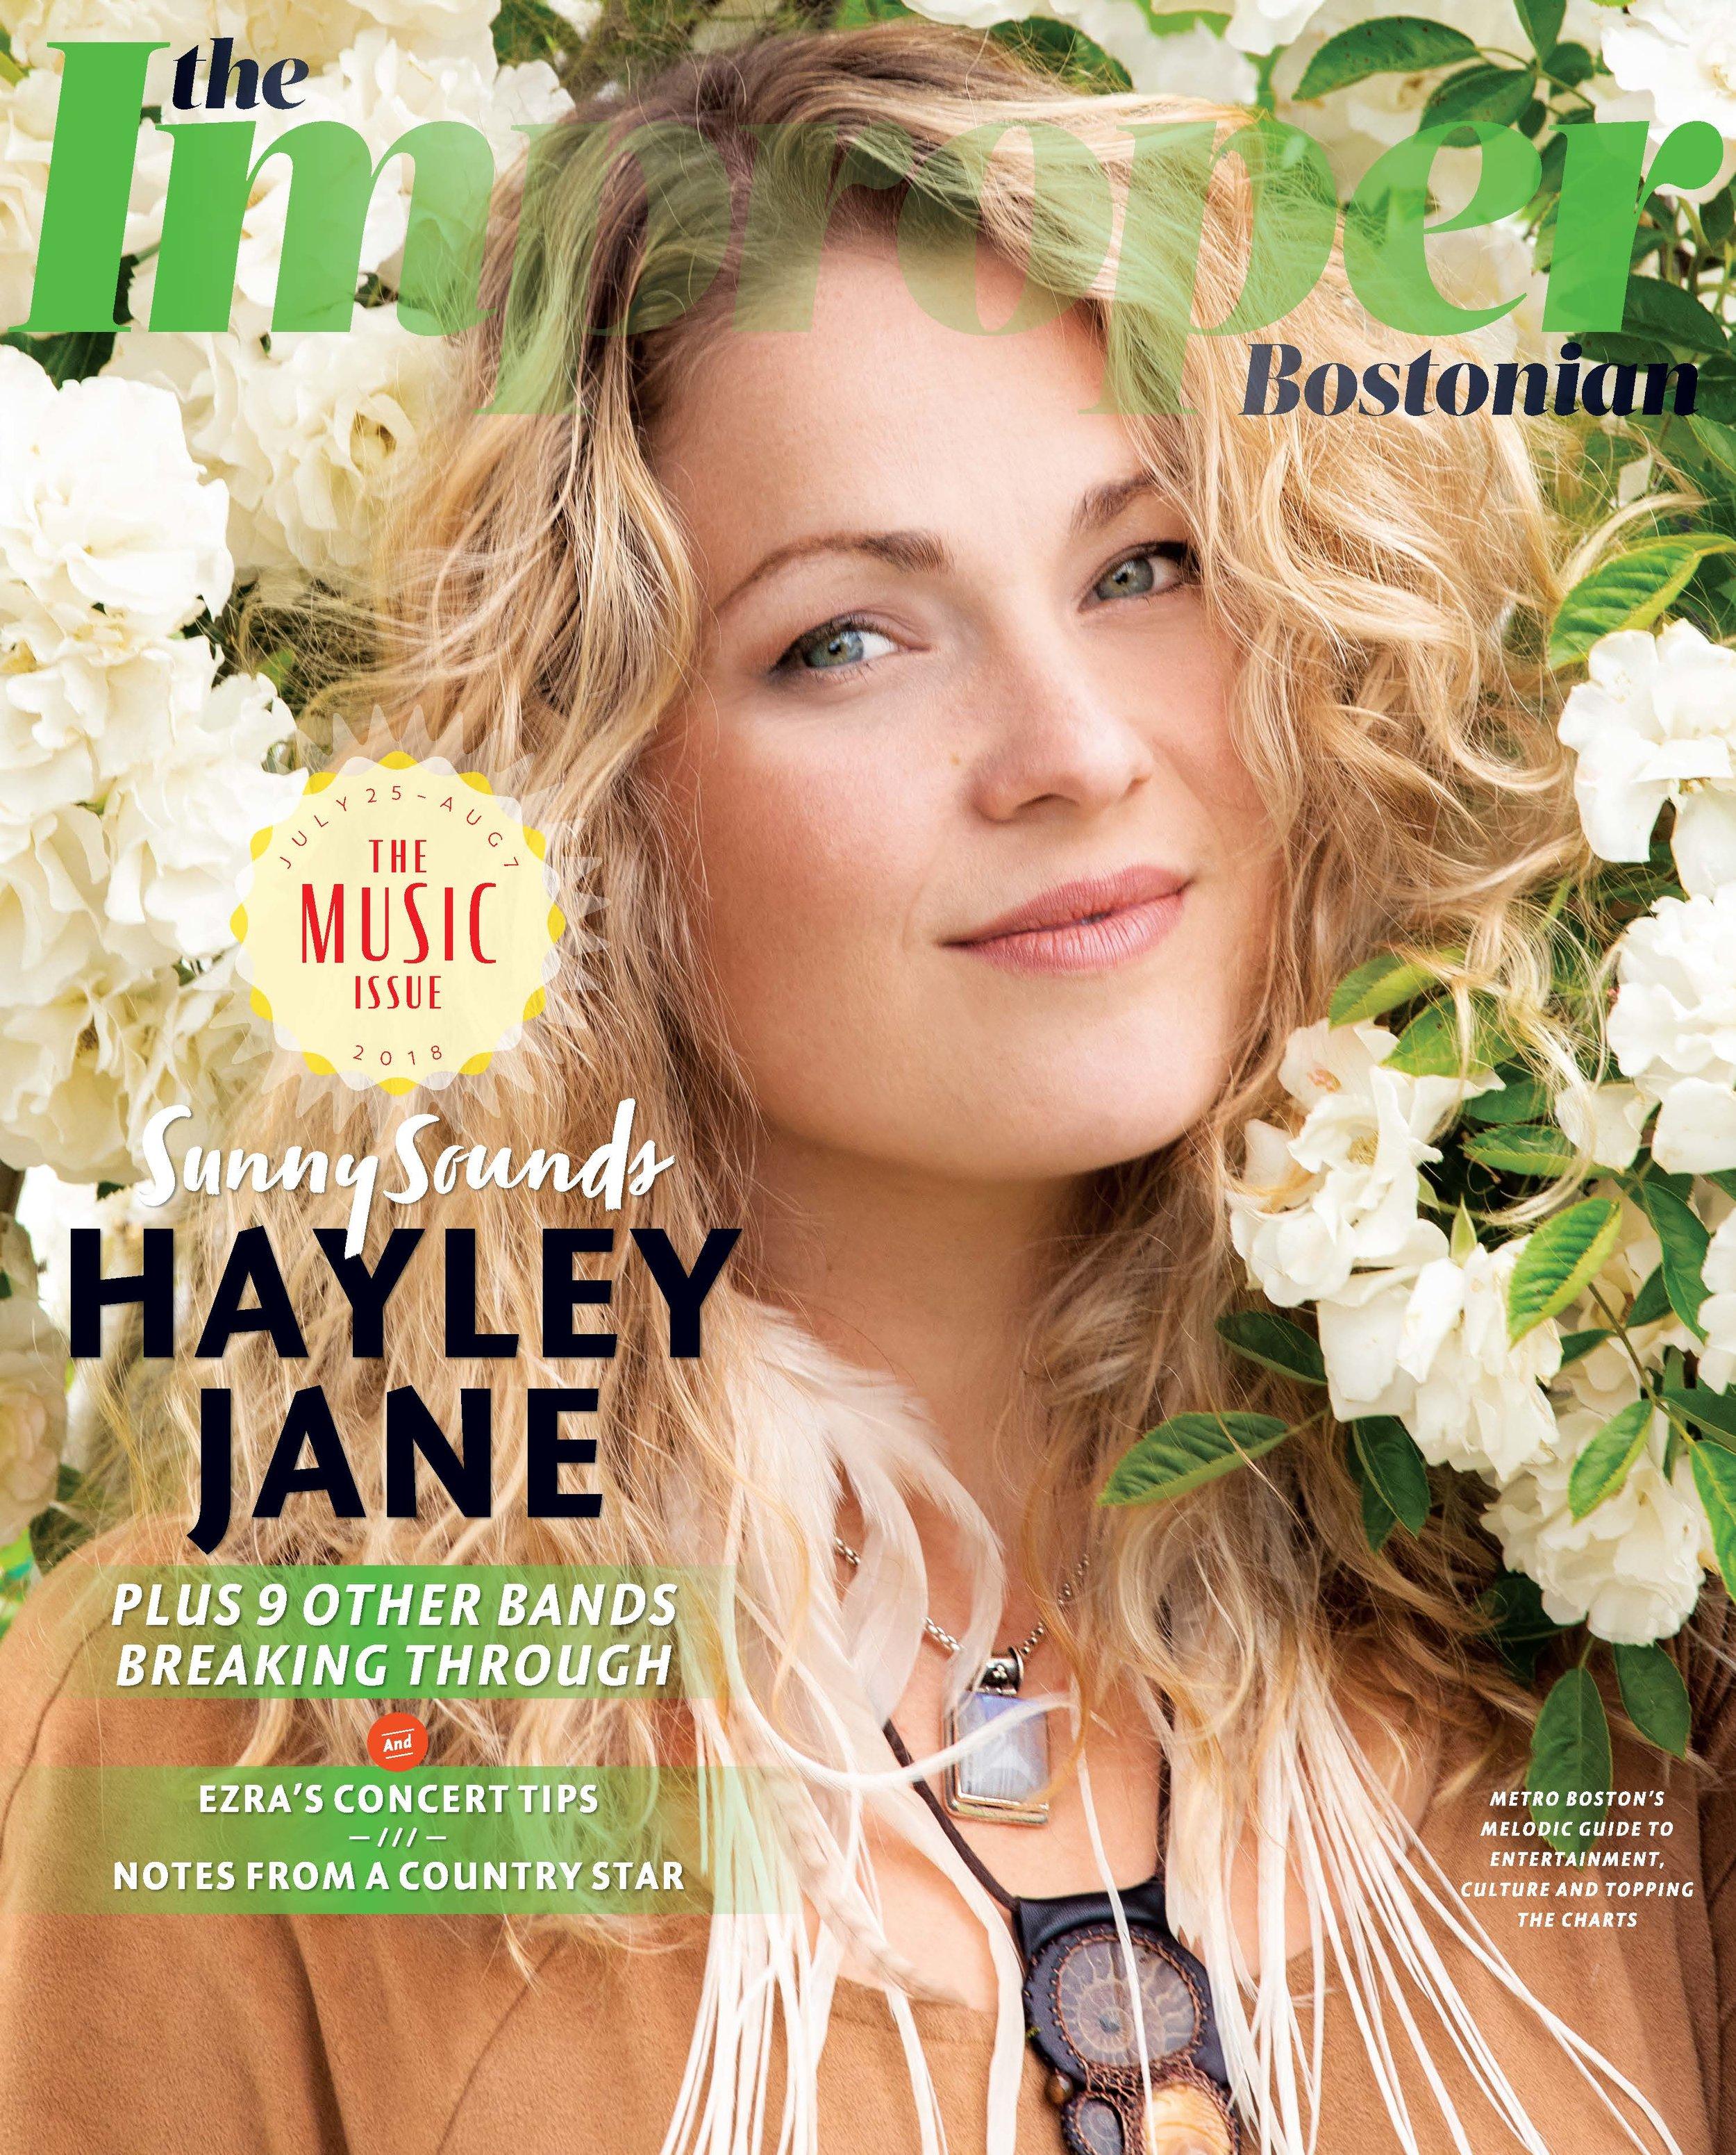 7.25-ImproperBostonian-Music-Cover-_HayleyJane-242x300.jpg